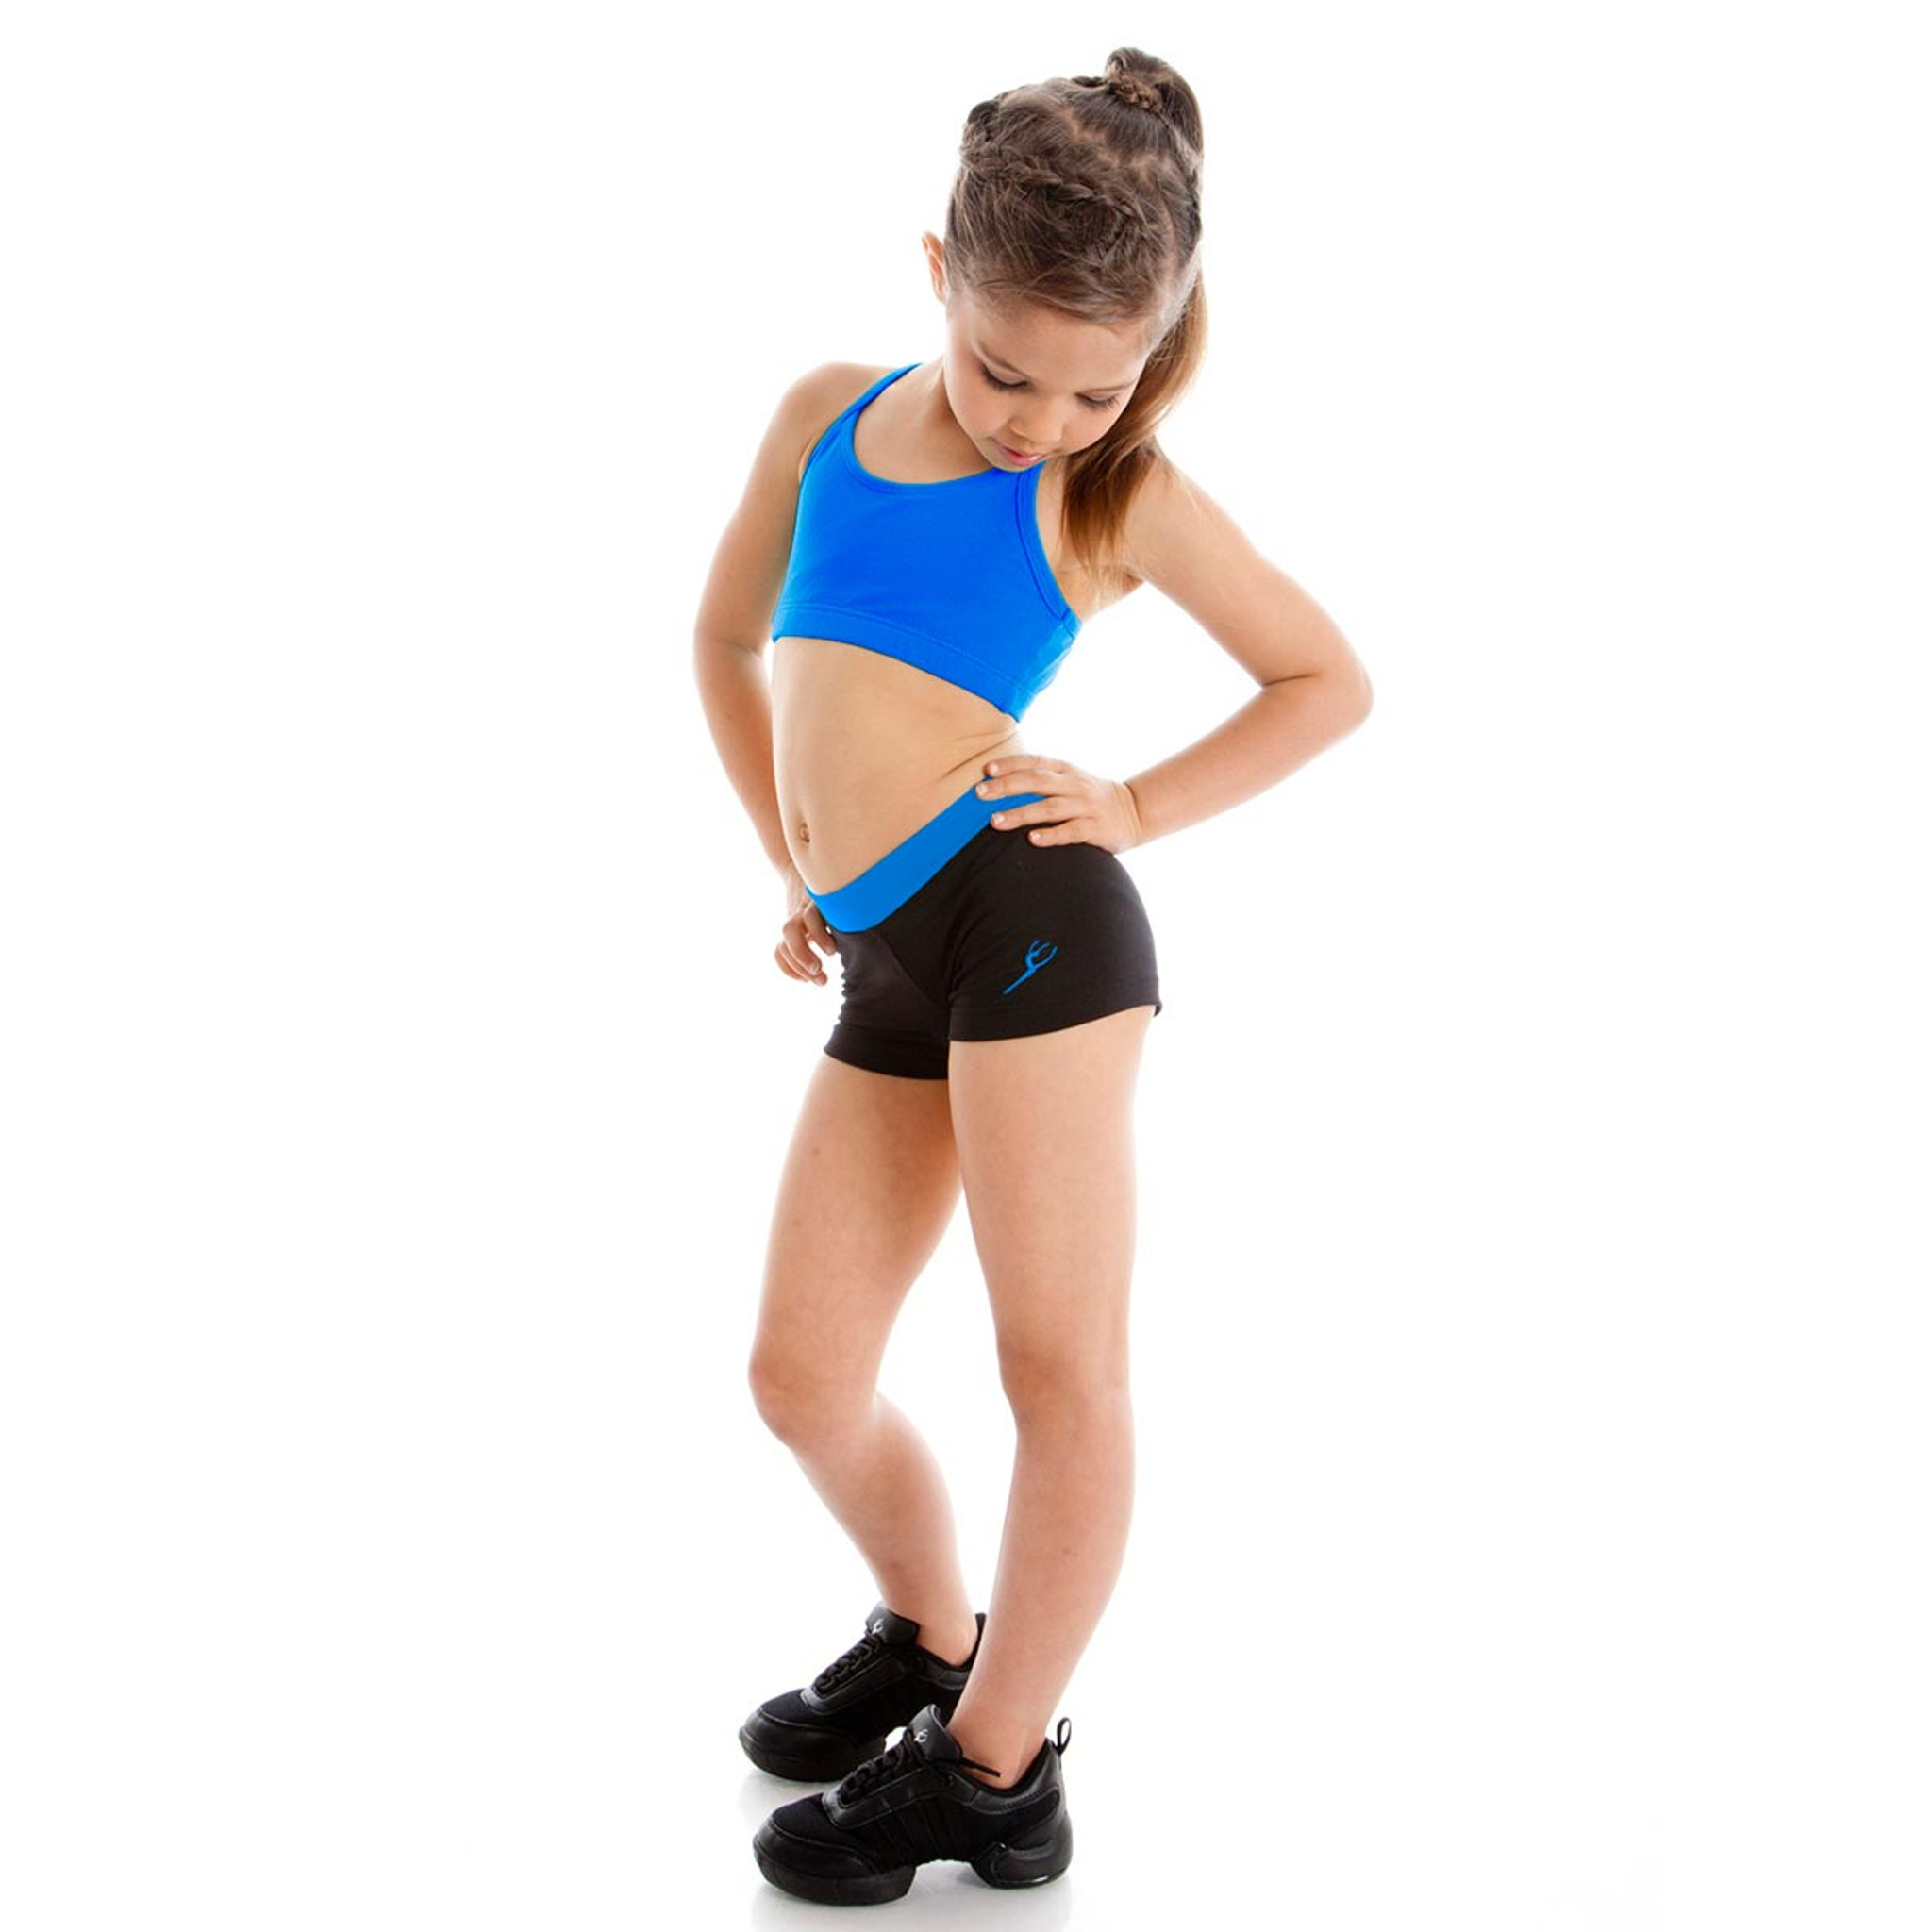 70e05ca83 Straight Band Dance Shorts - Girls Short-Energetiks Short